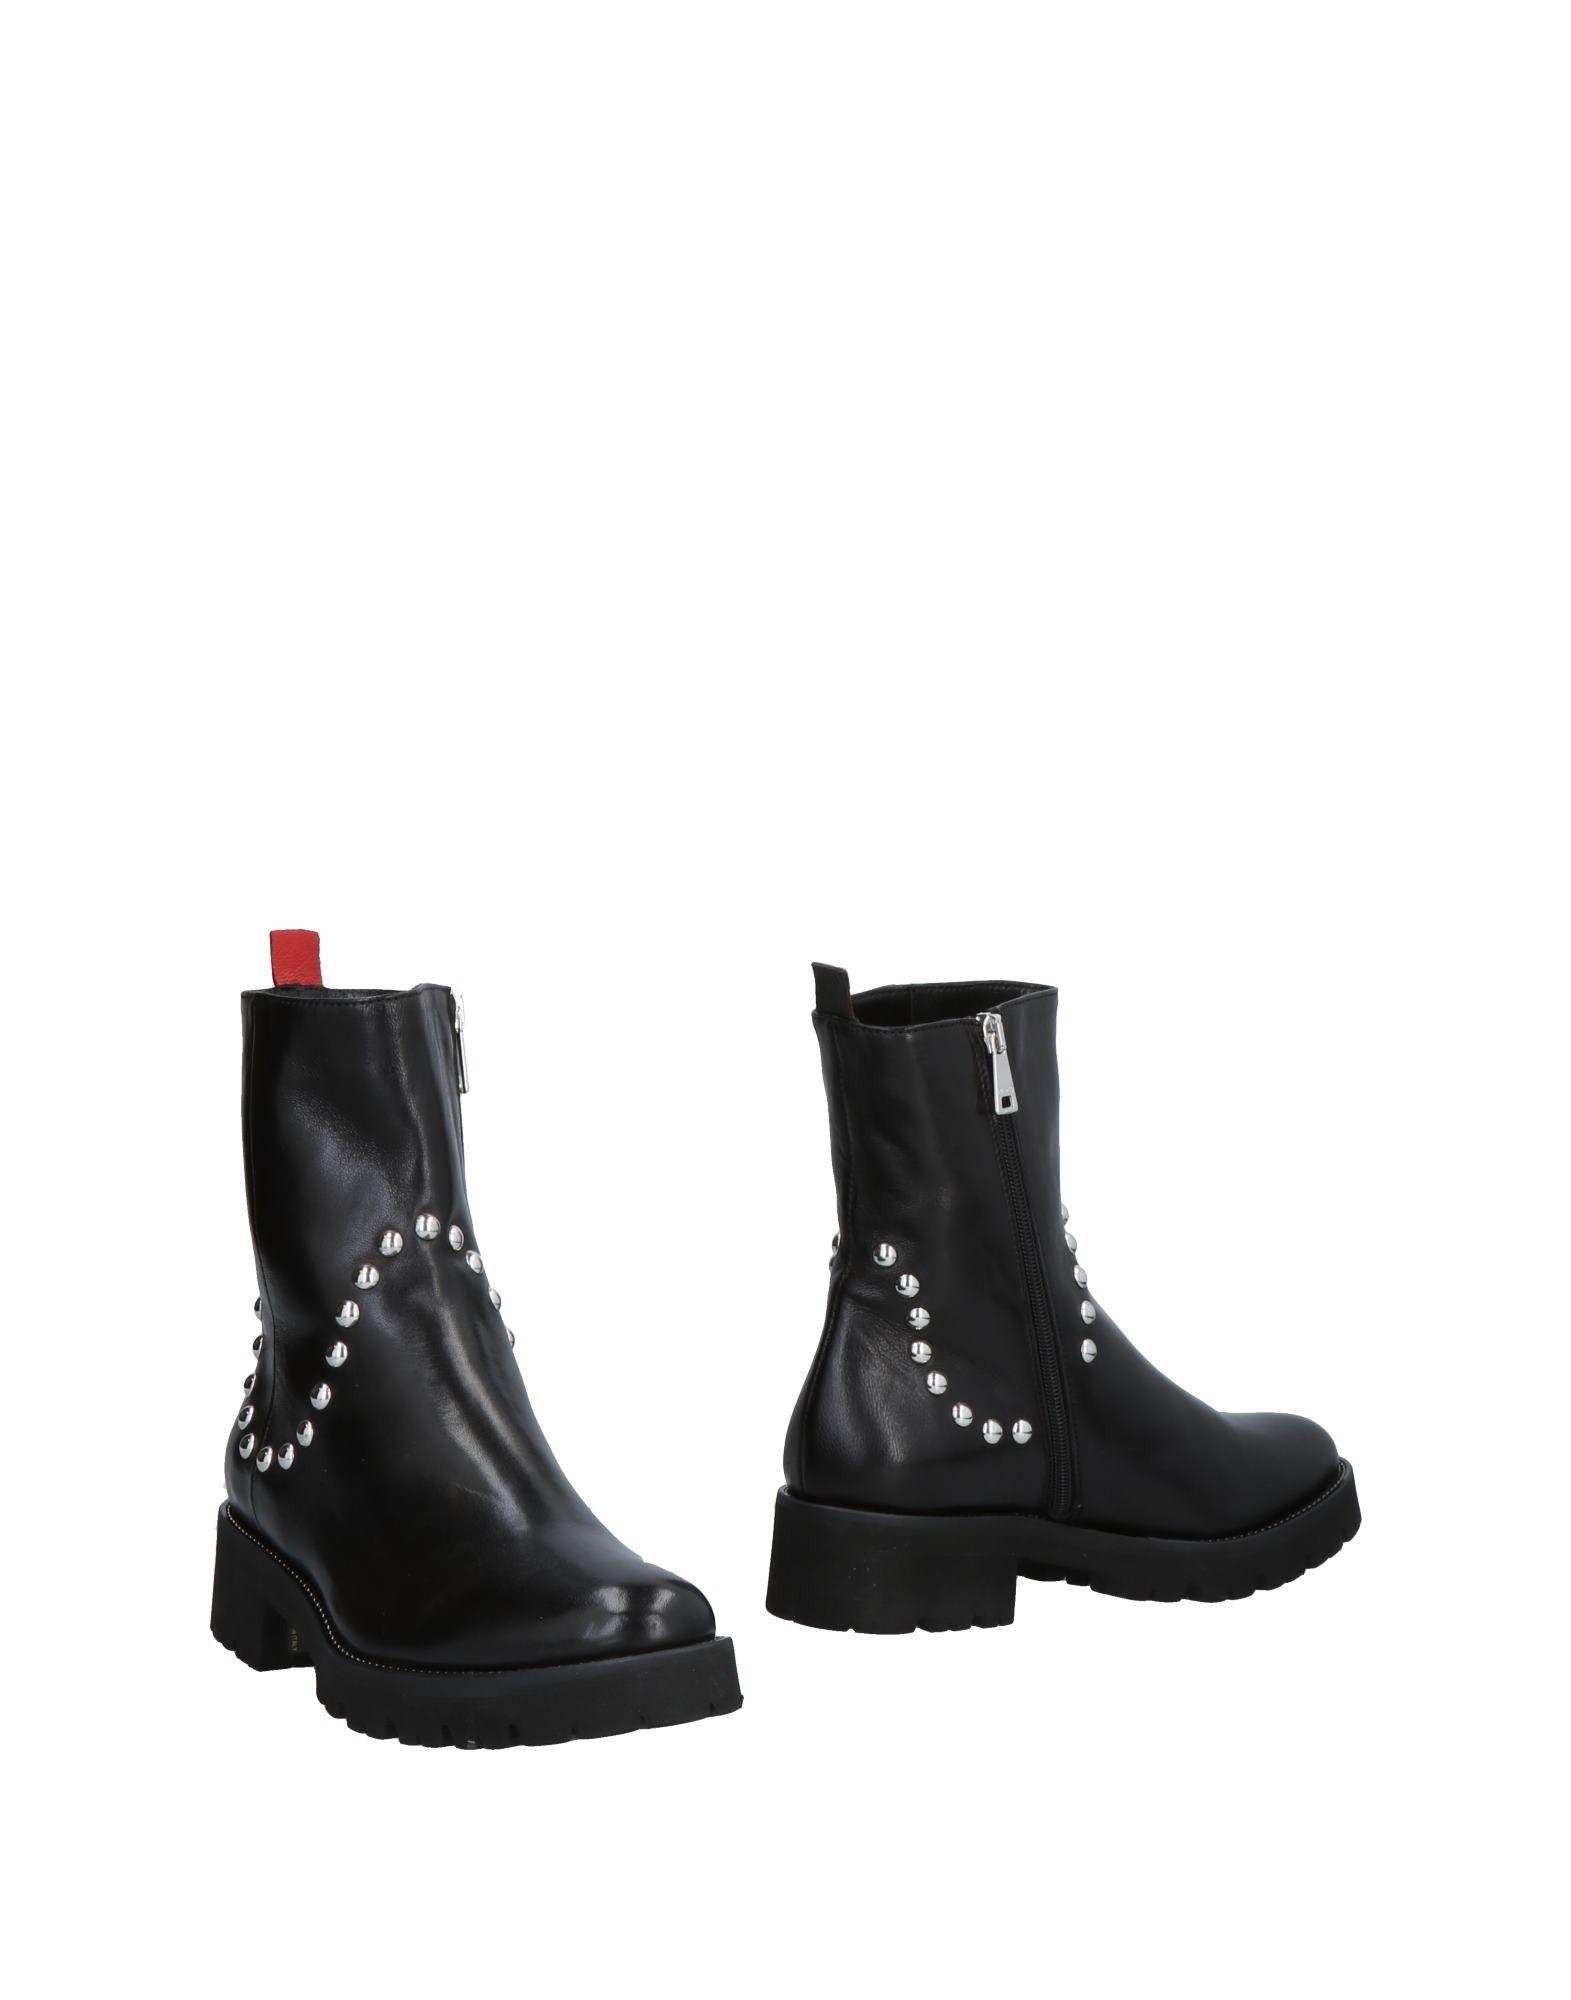 Ma & Lo' Stiefelette Damen Damen Damen  11486061HC Gute Qualität beliebte Schuhe 1aa348